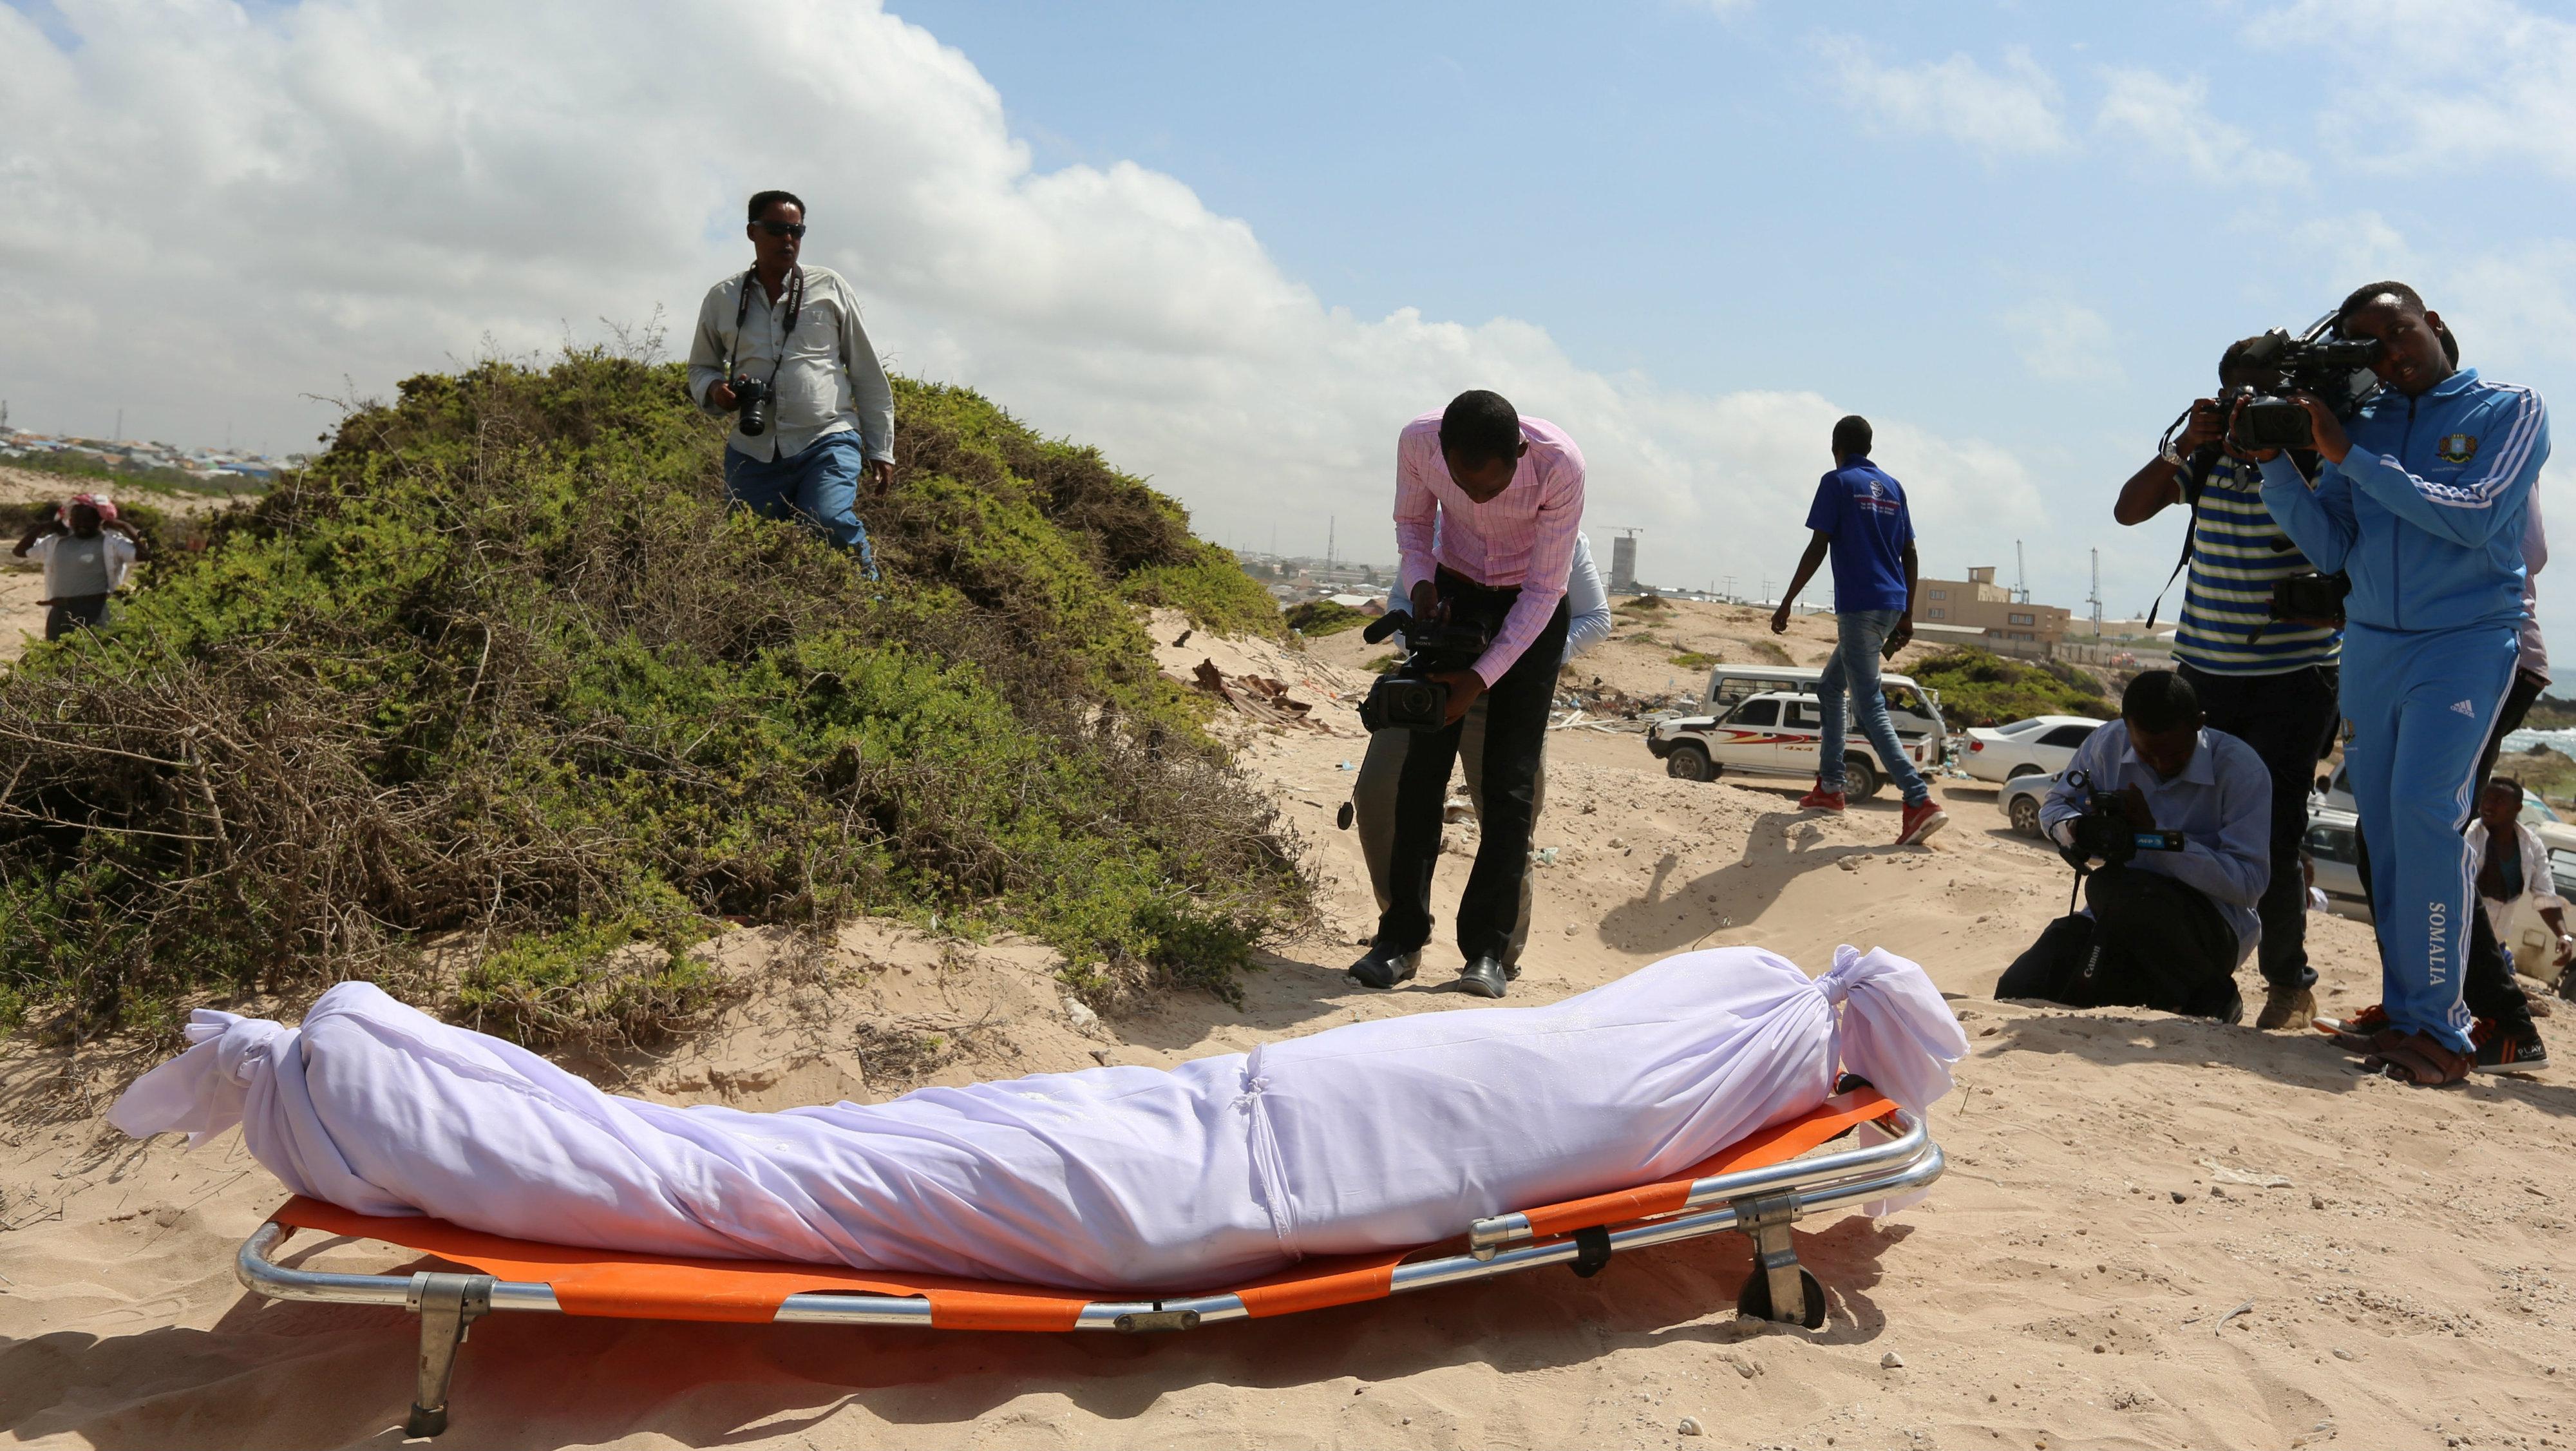 Journalist take photos during the funeral of Abdiasis Ali Haji, a Somali radio journalist who was killed by unknown gunmen in Somalia's capital Mogadishu, September 28, 2016.